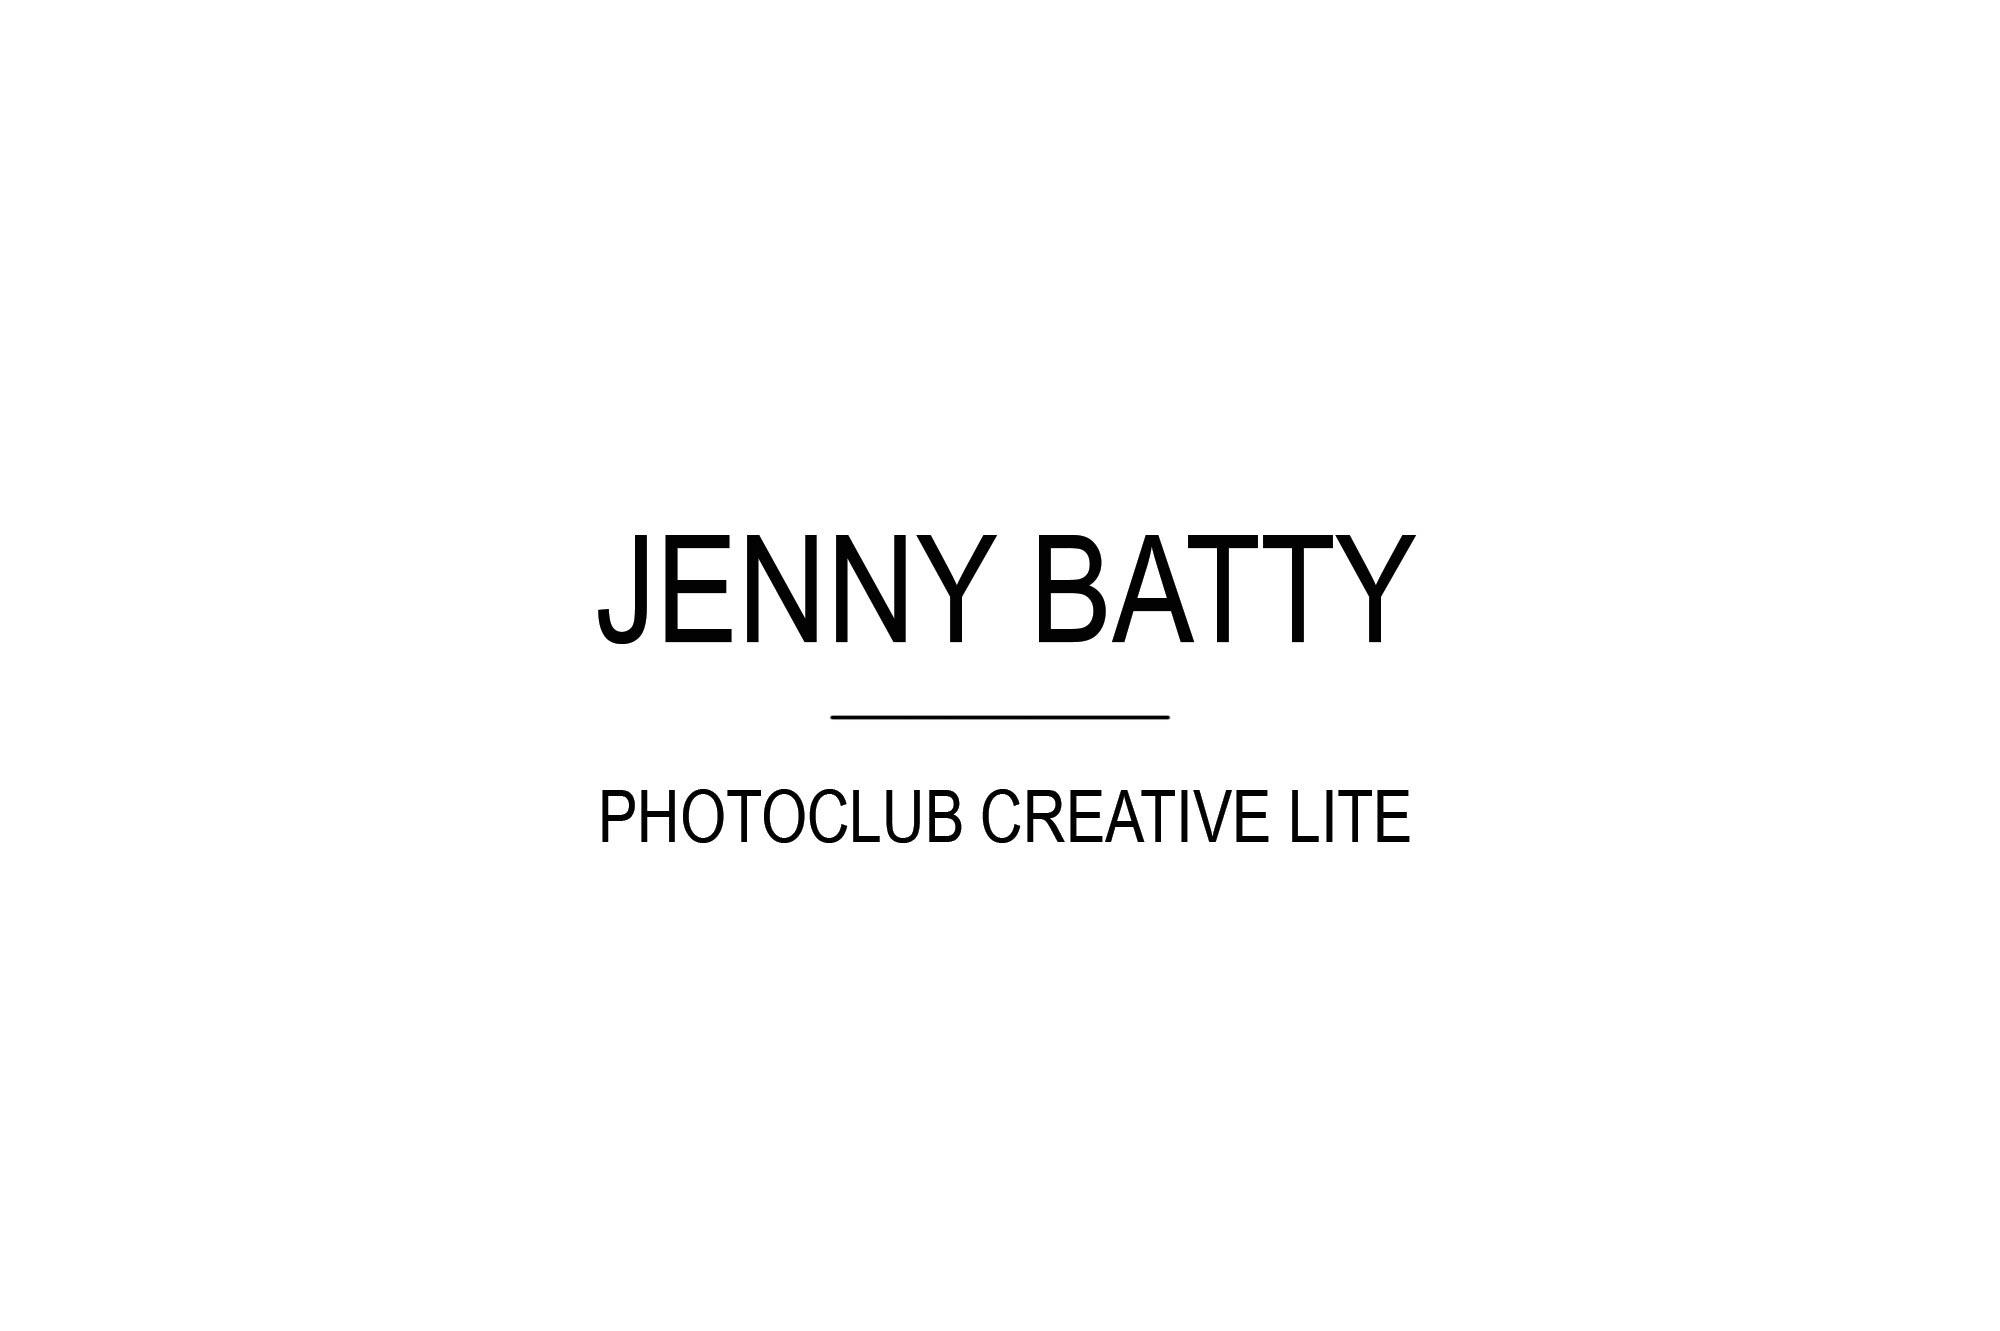 JennyBatty_00_Title_WhtBg.jpg